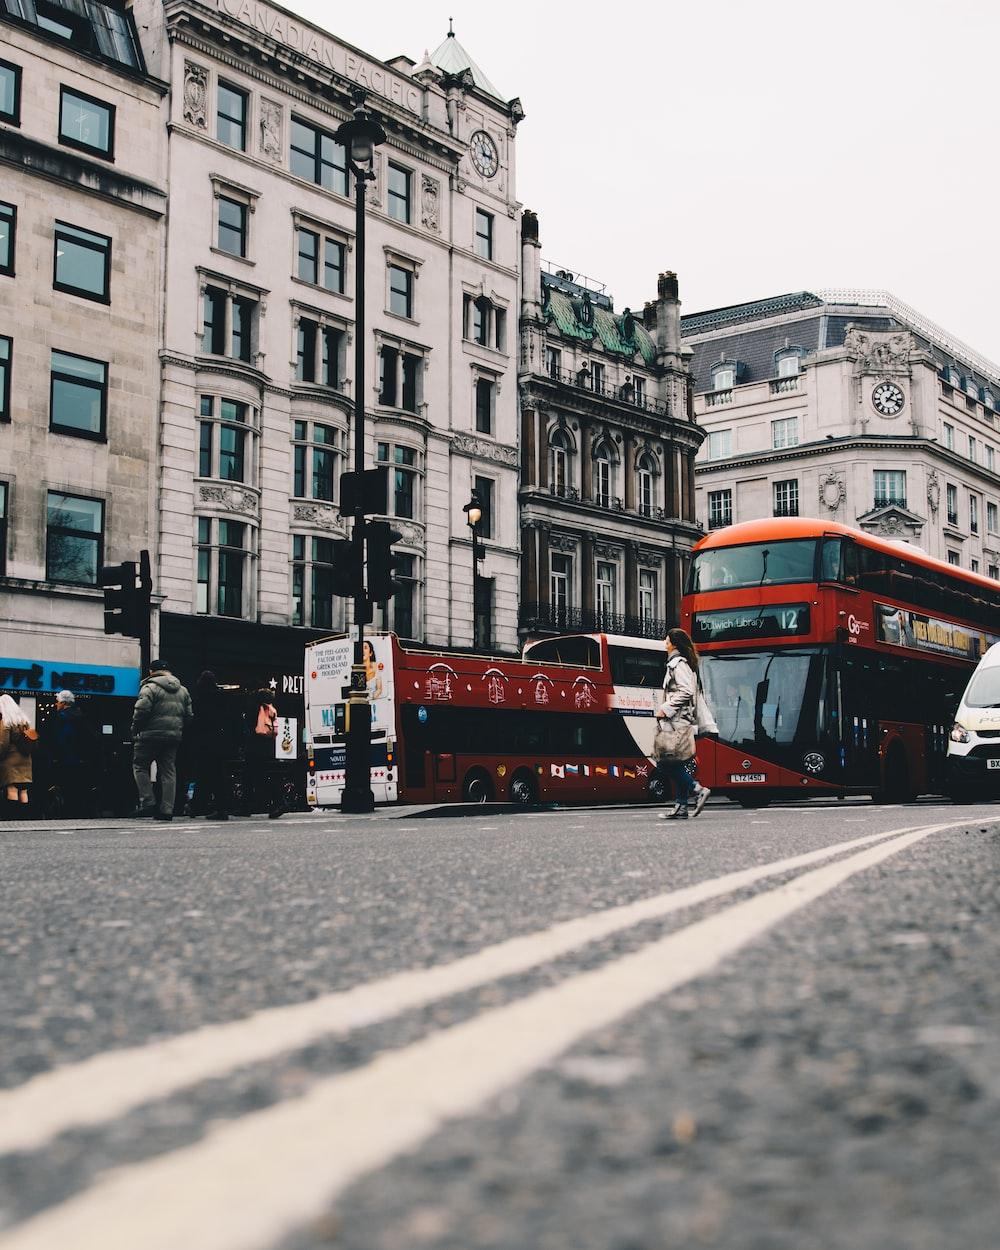 double-decker bus passing near white building